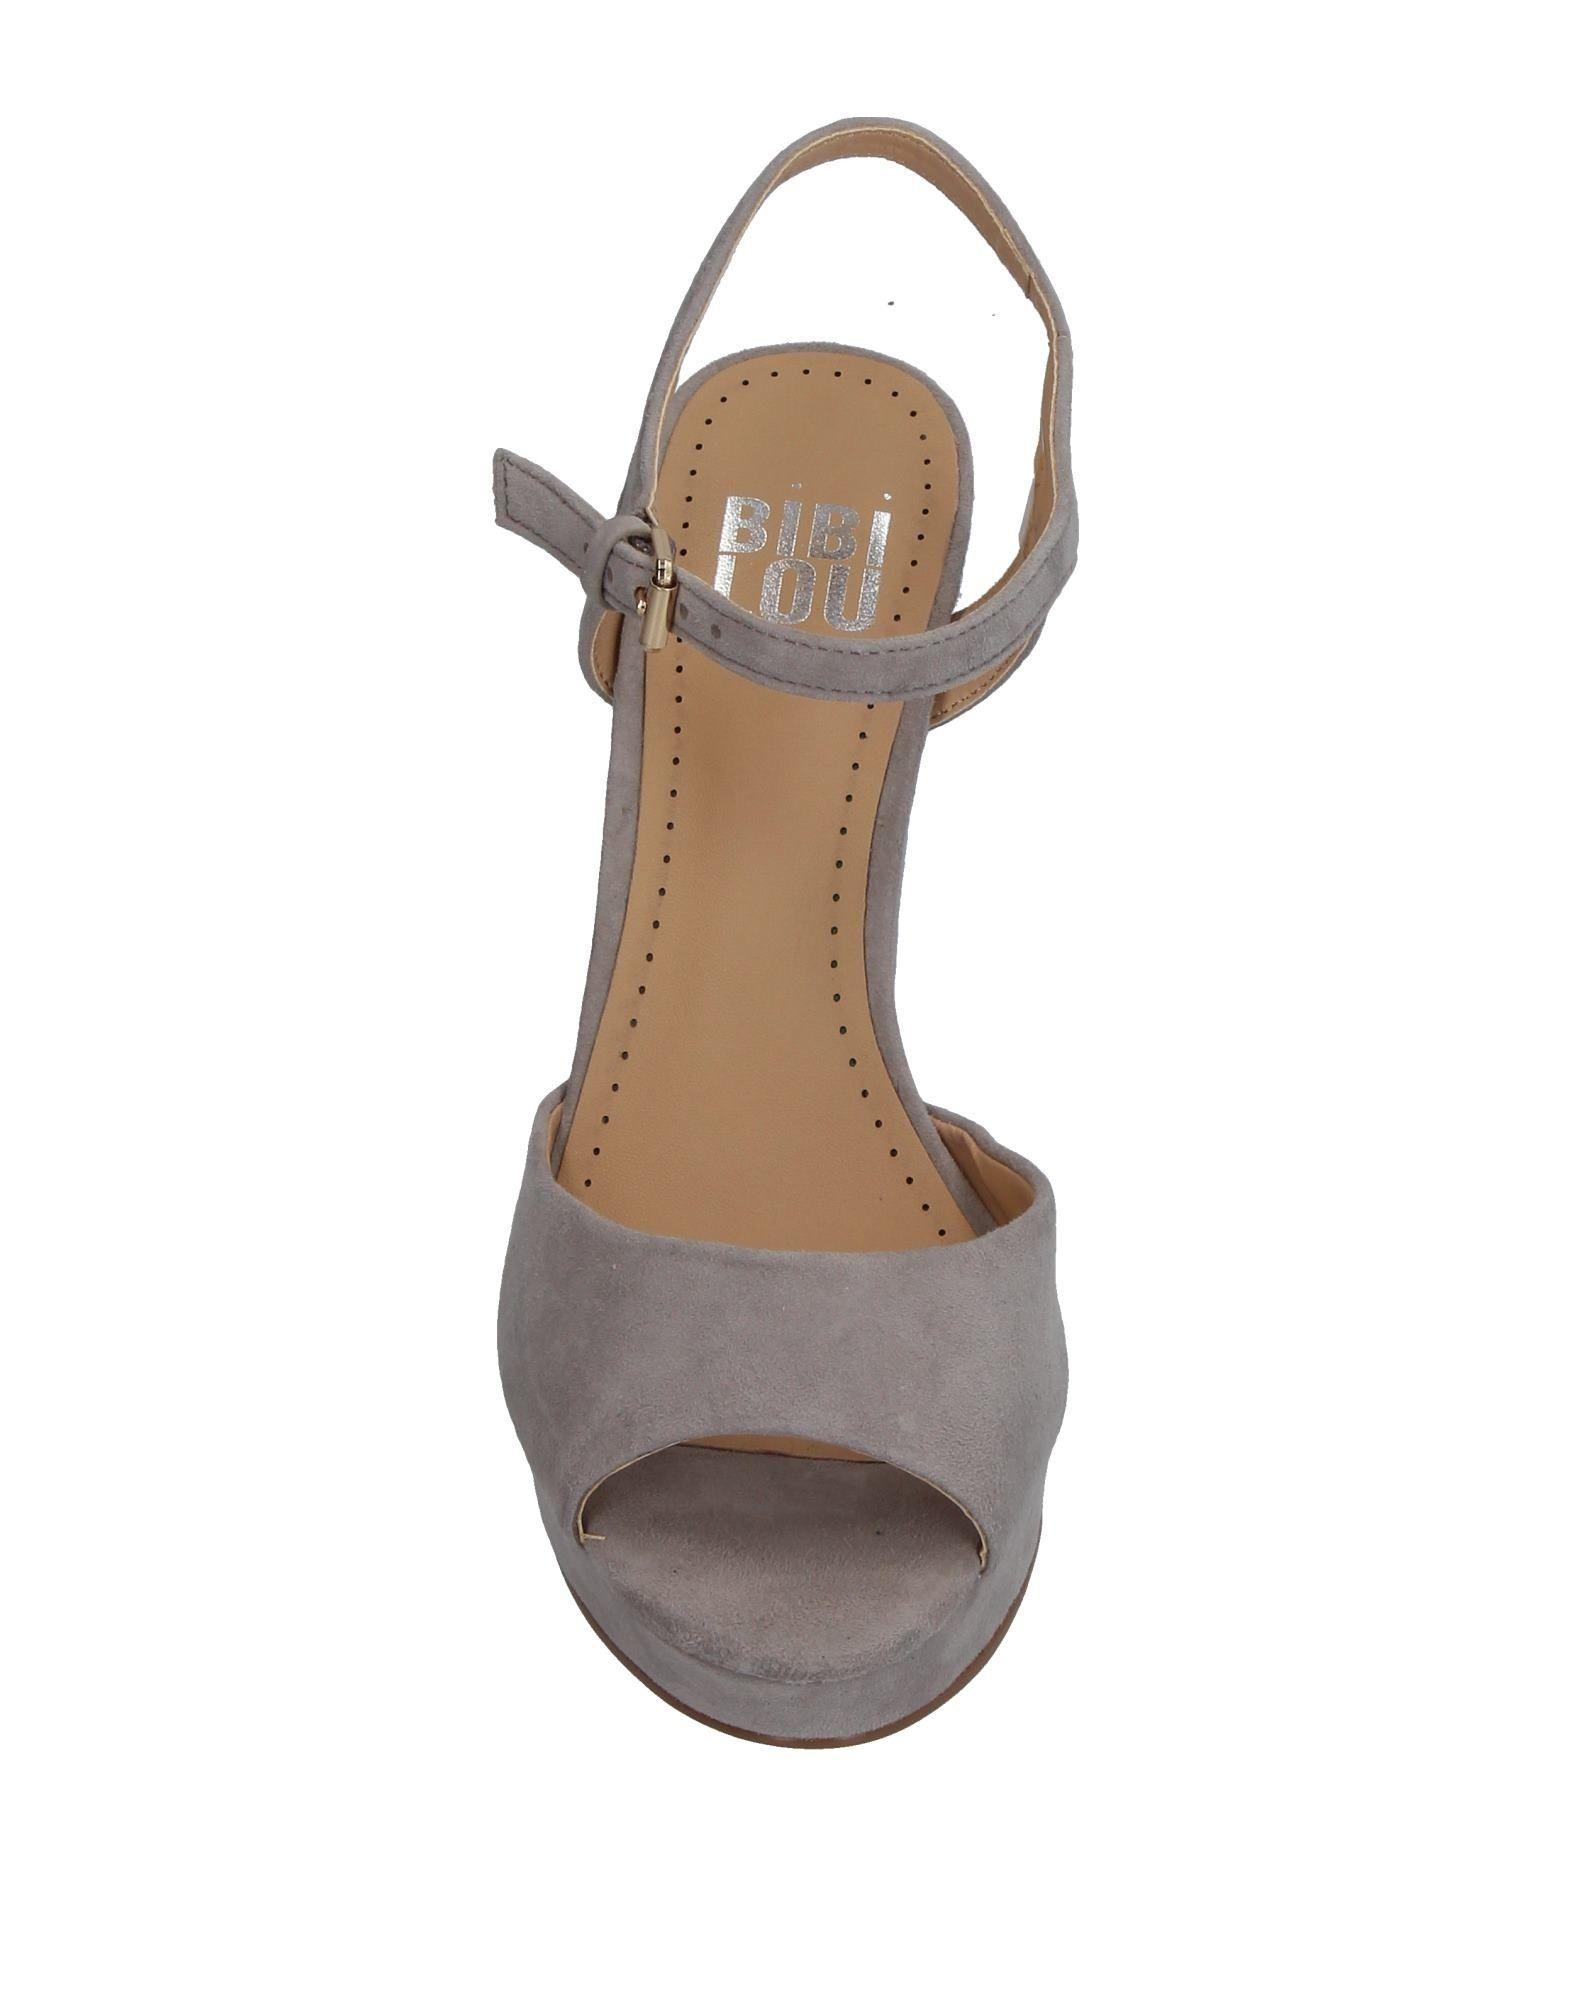 Bibi Lou Lou Bibi Sandalen Damen  11343038BH Neue Schuhe c8593d